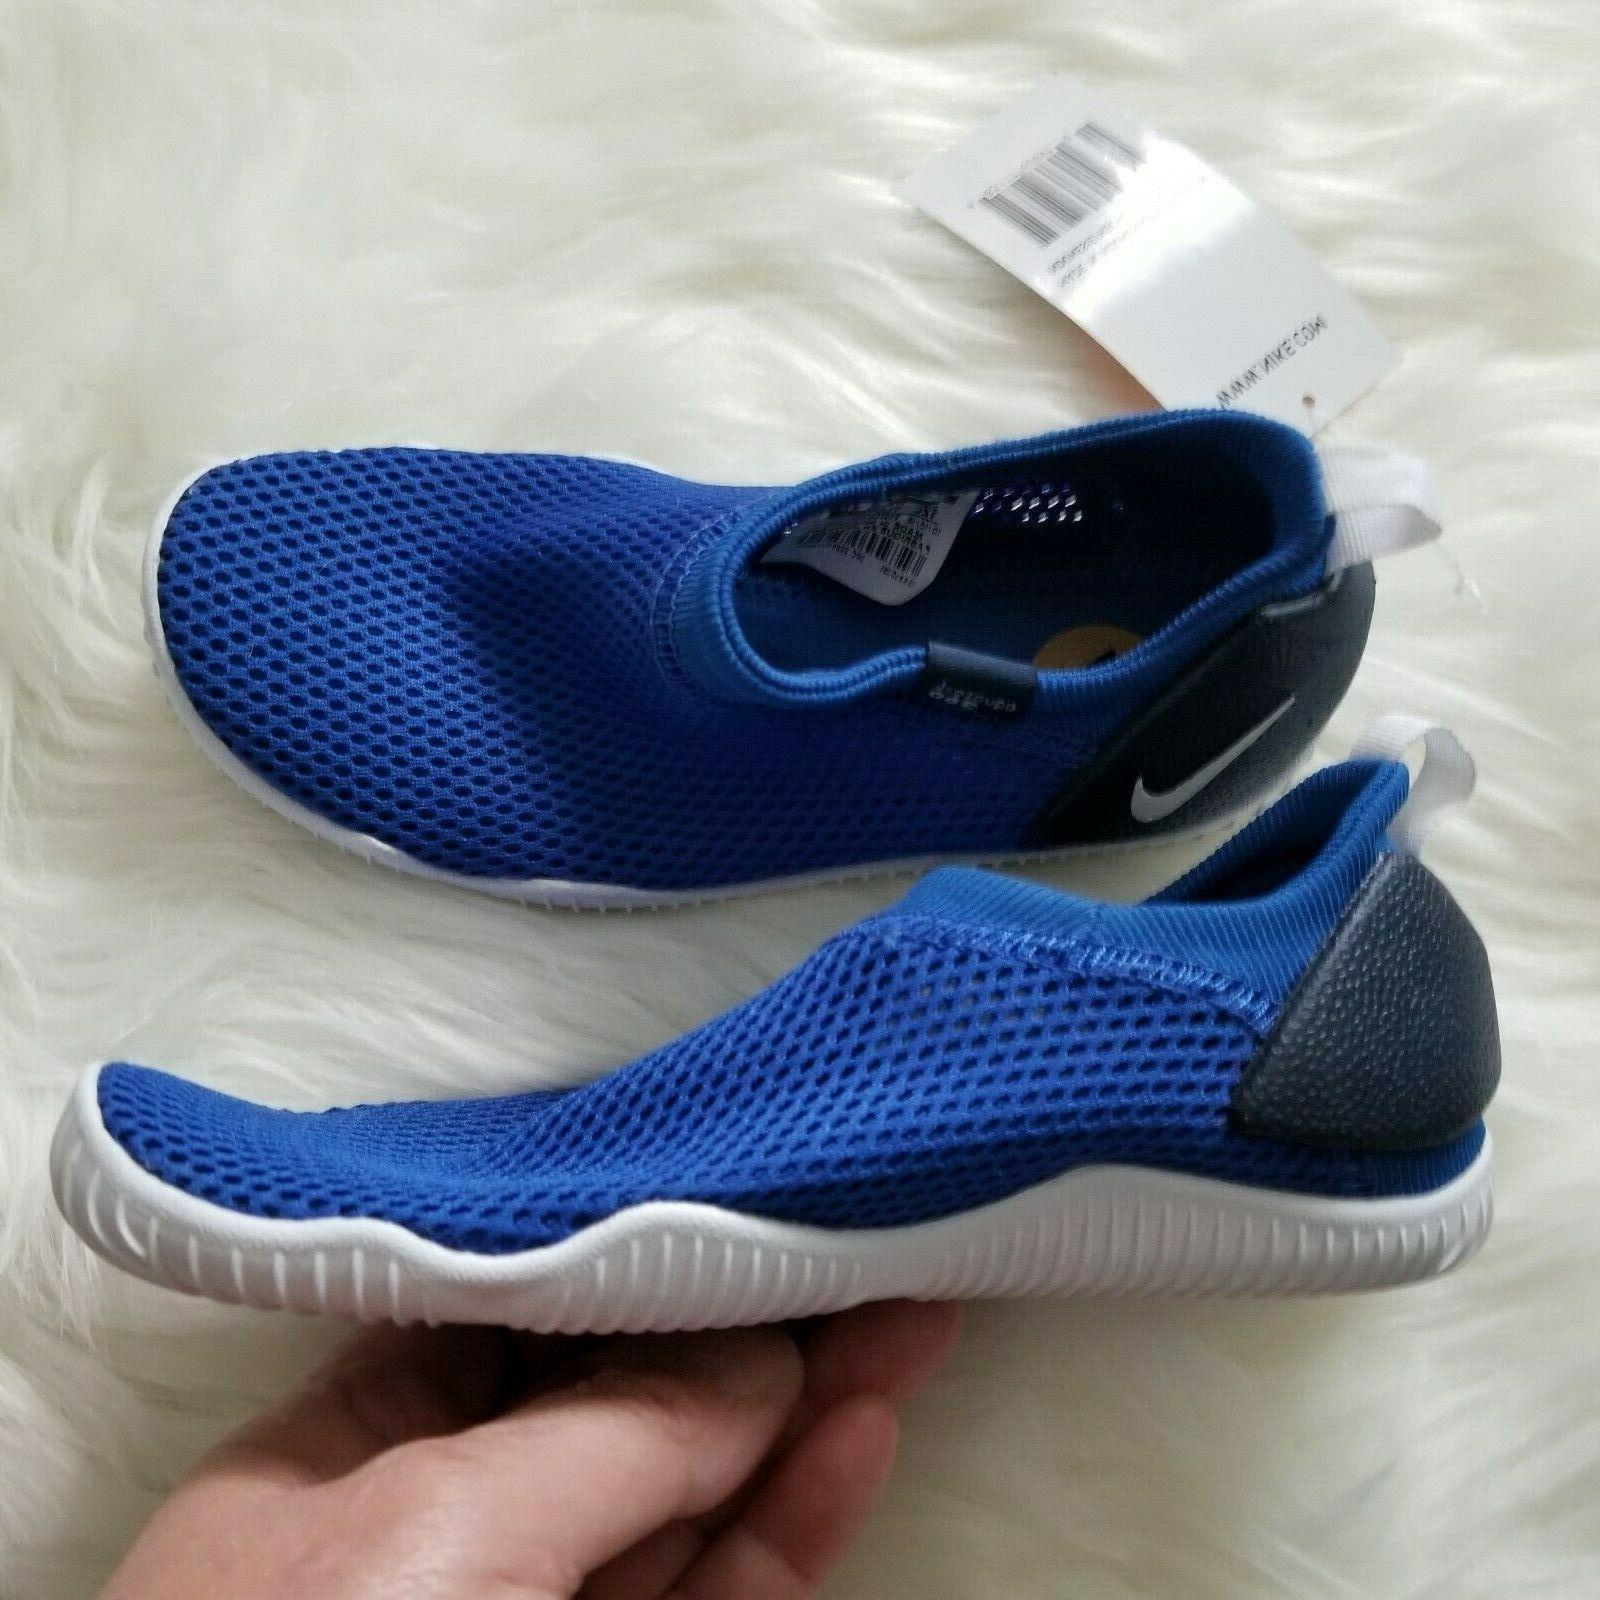 NWT $50 NIKE Boys Aqua Sock 360 Shoes & COLOR